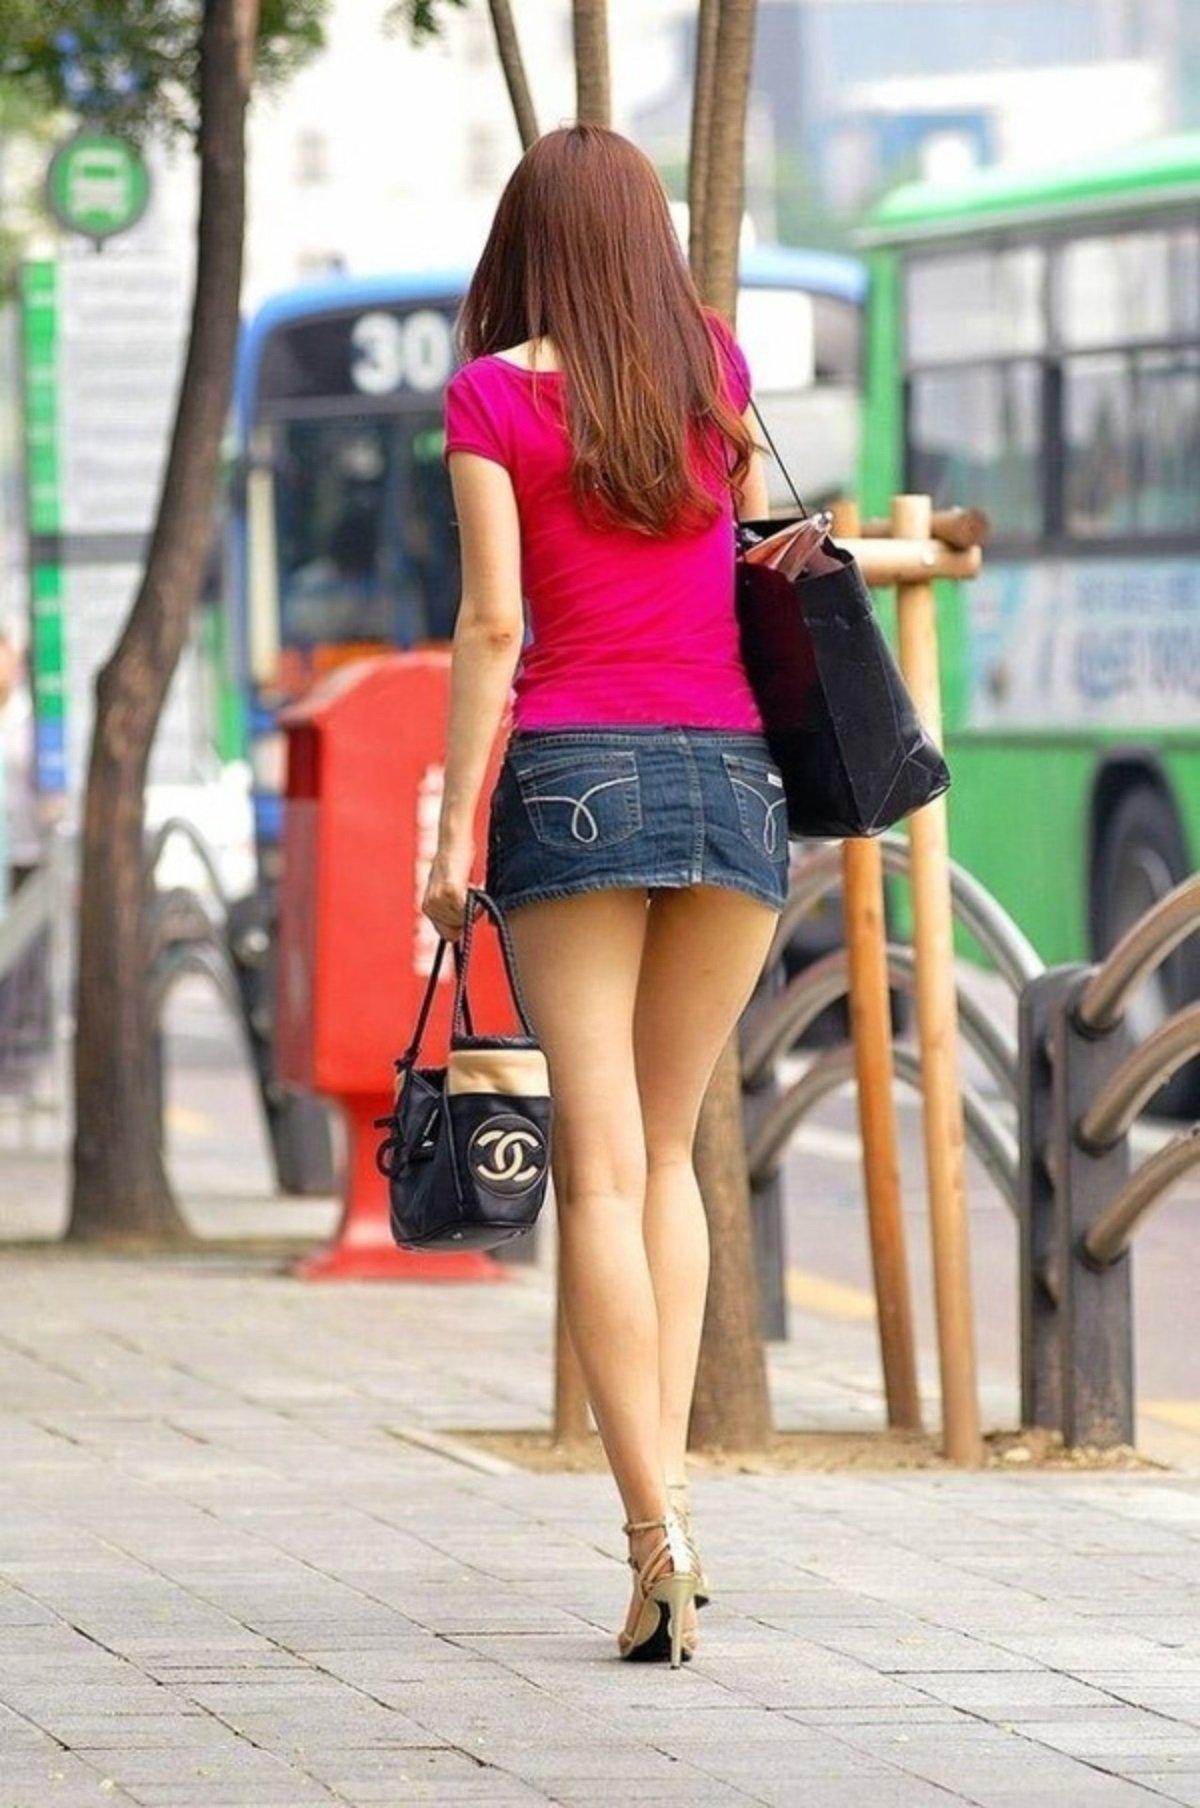 Девушки на улице в мини-юбках